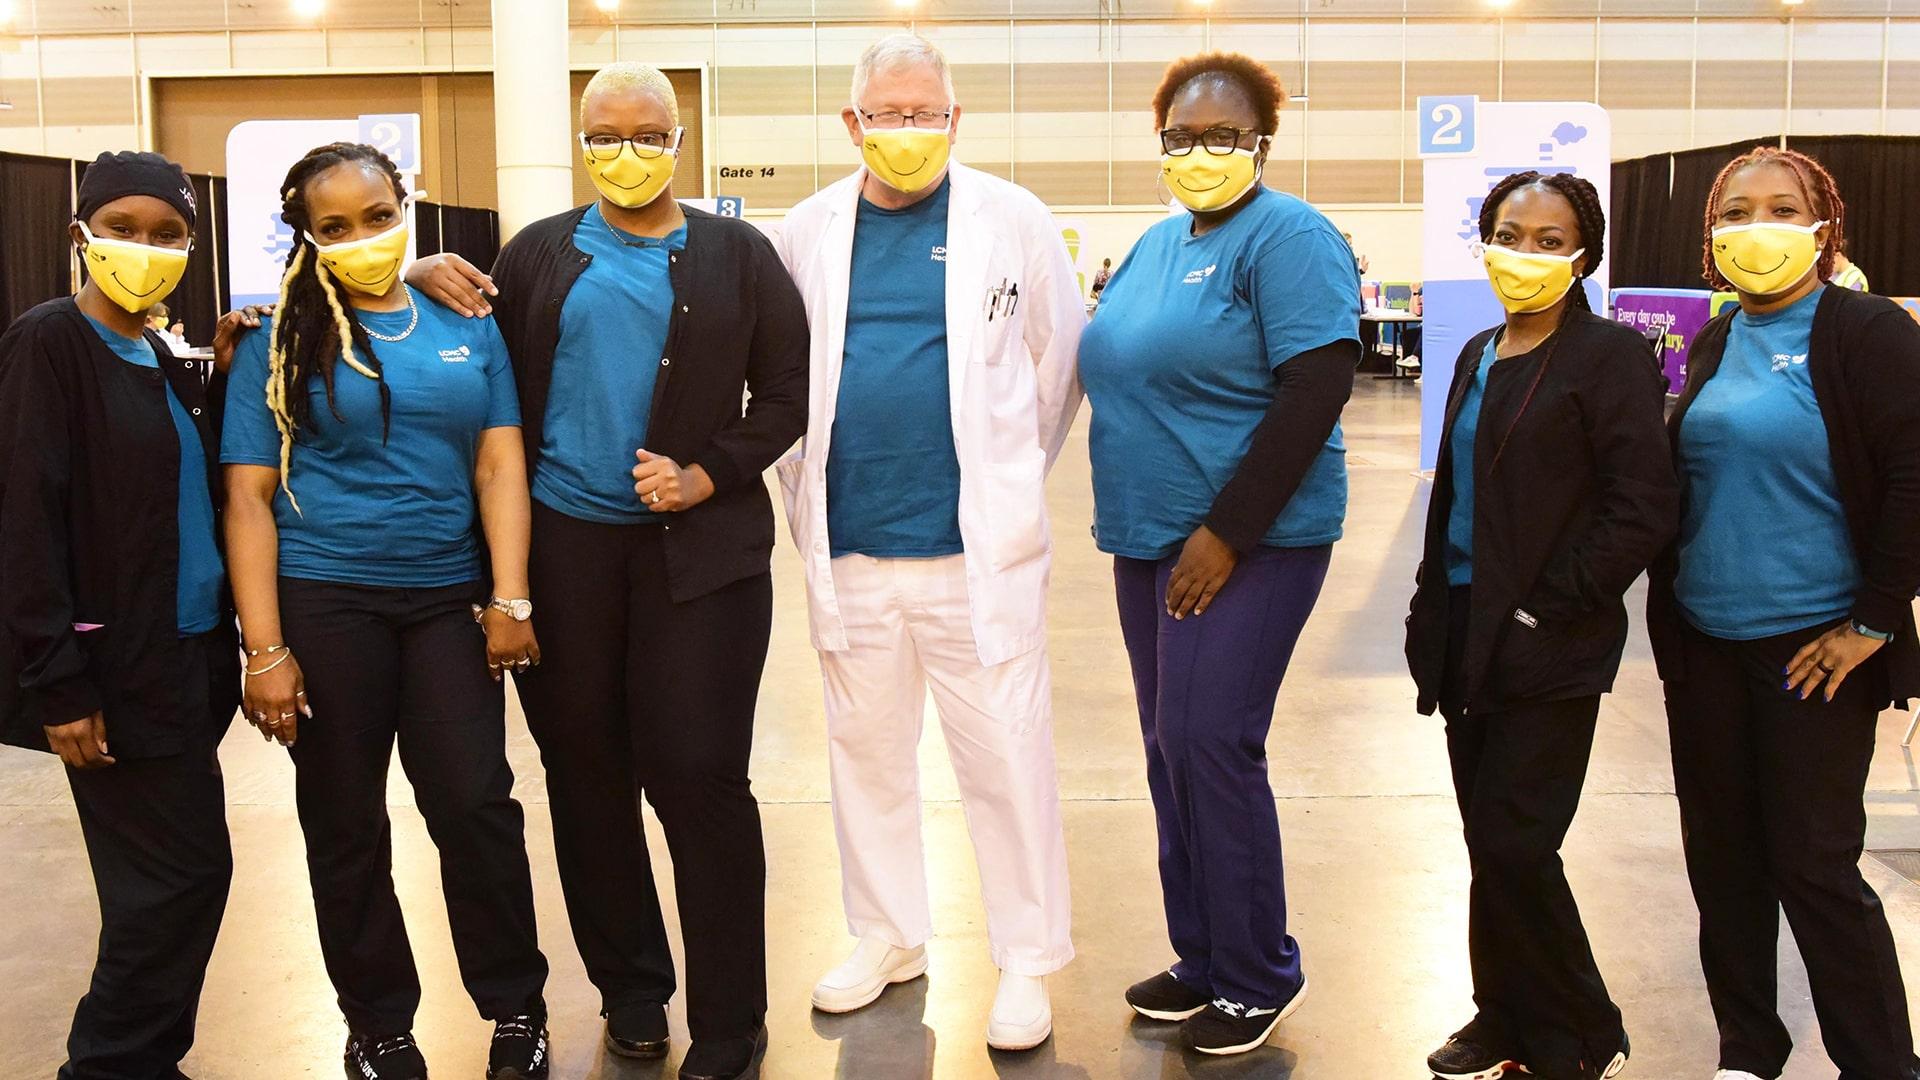 QSS COVID vaccination staff members